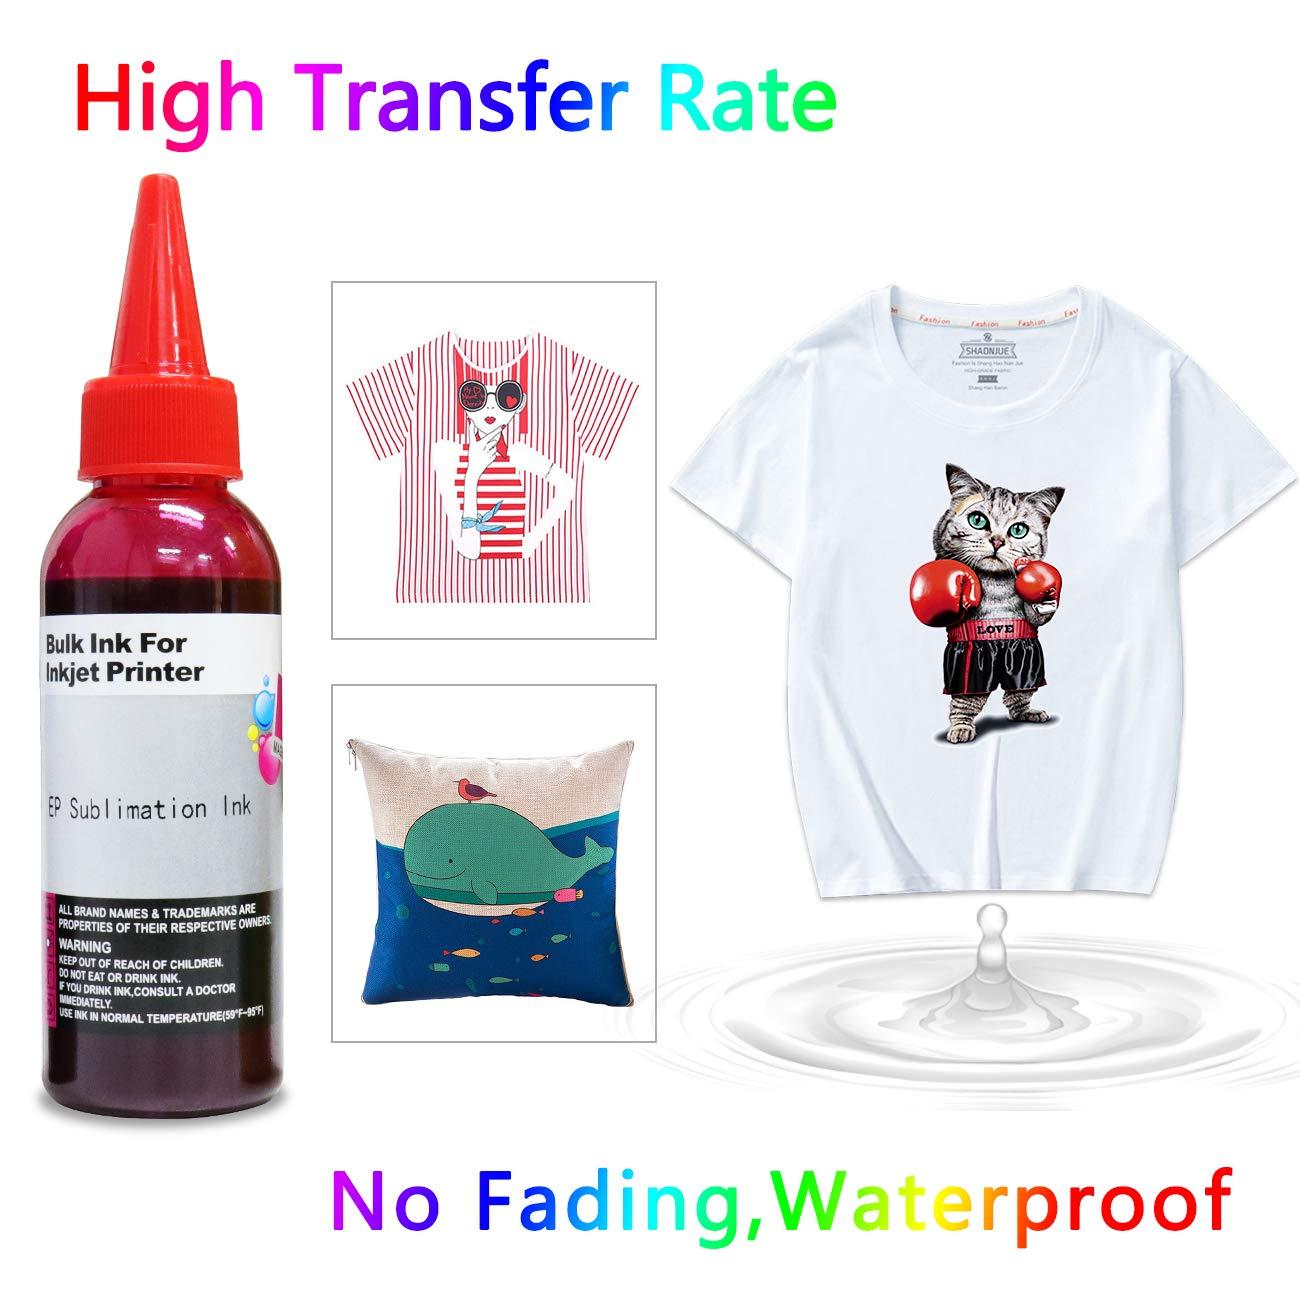 400ml Sublimation Ink for Epson Inkjet Printers C88+ C88 WF7610 WF7010  WF7710 WF7720 WF7110 WF7210 WF3640 WF3610 WF3540 Heat Press Transfer on  Mugs,